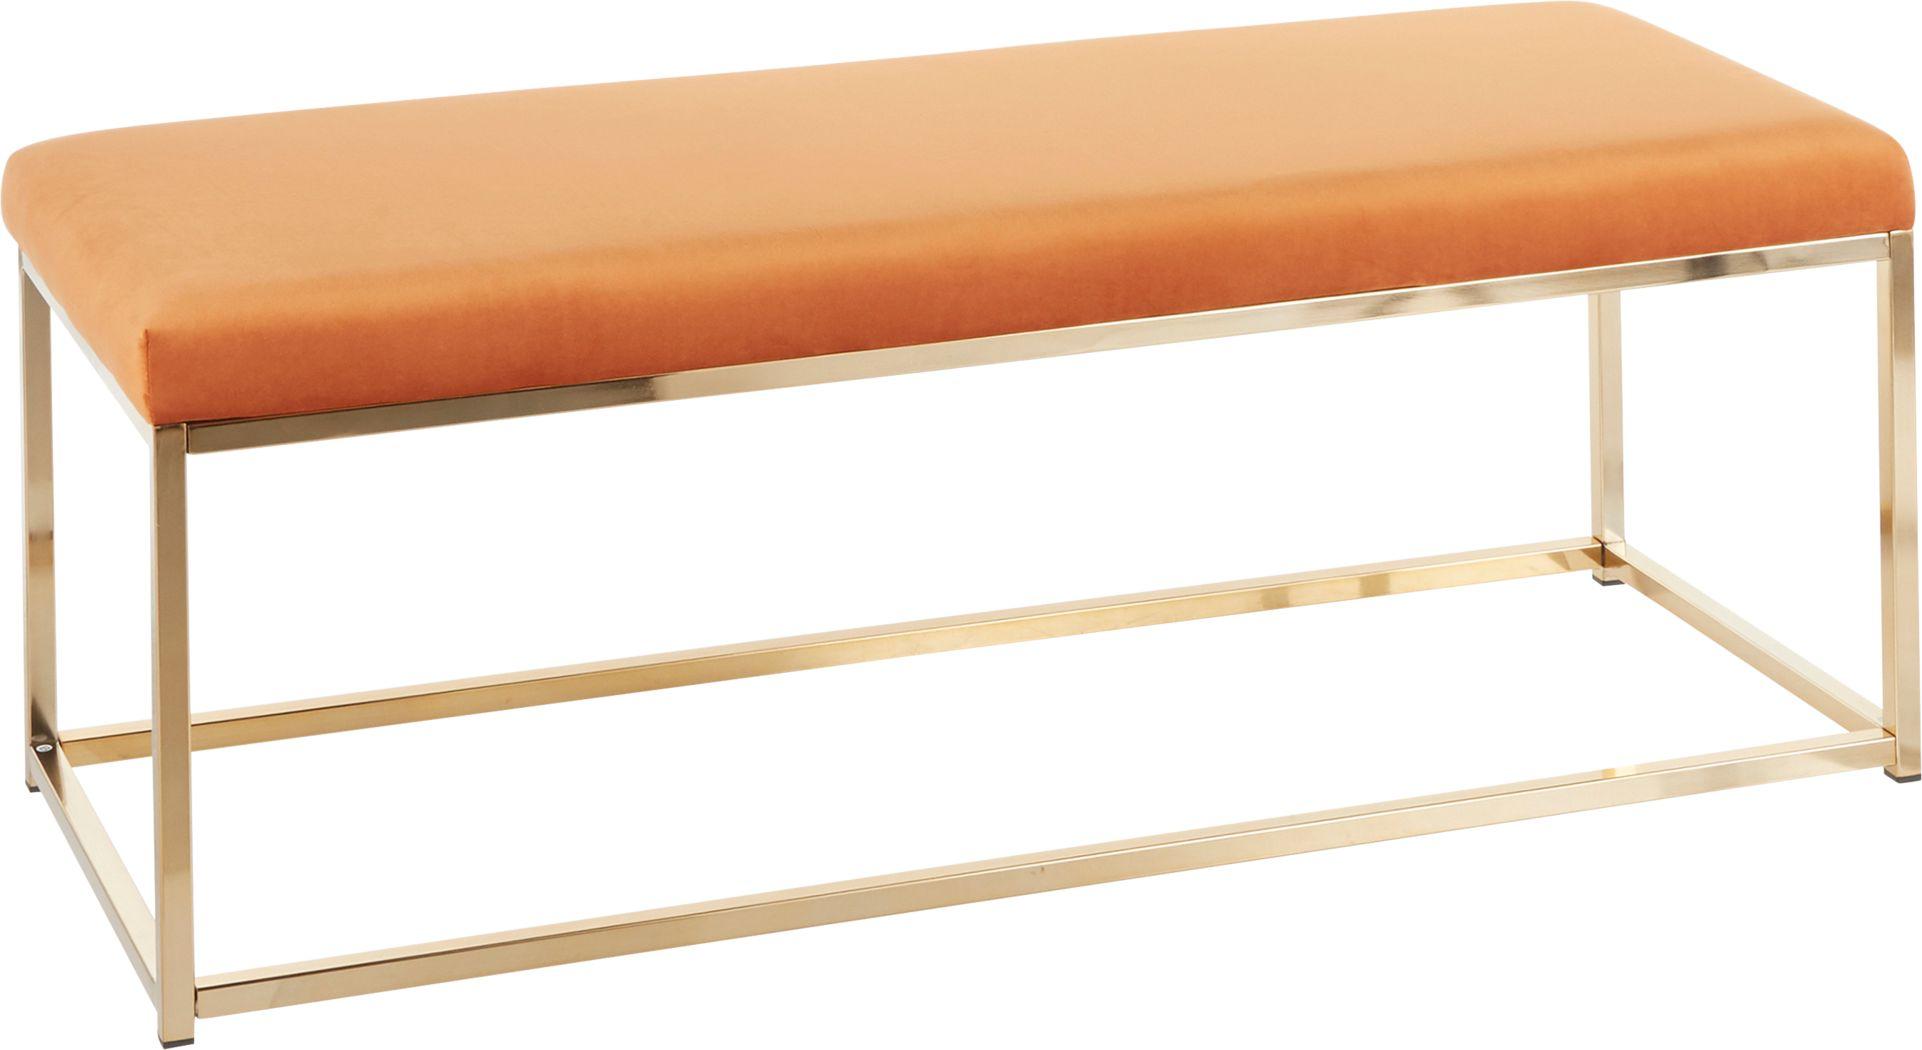 Zimpel Orange Accent Bench